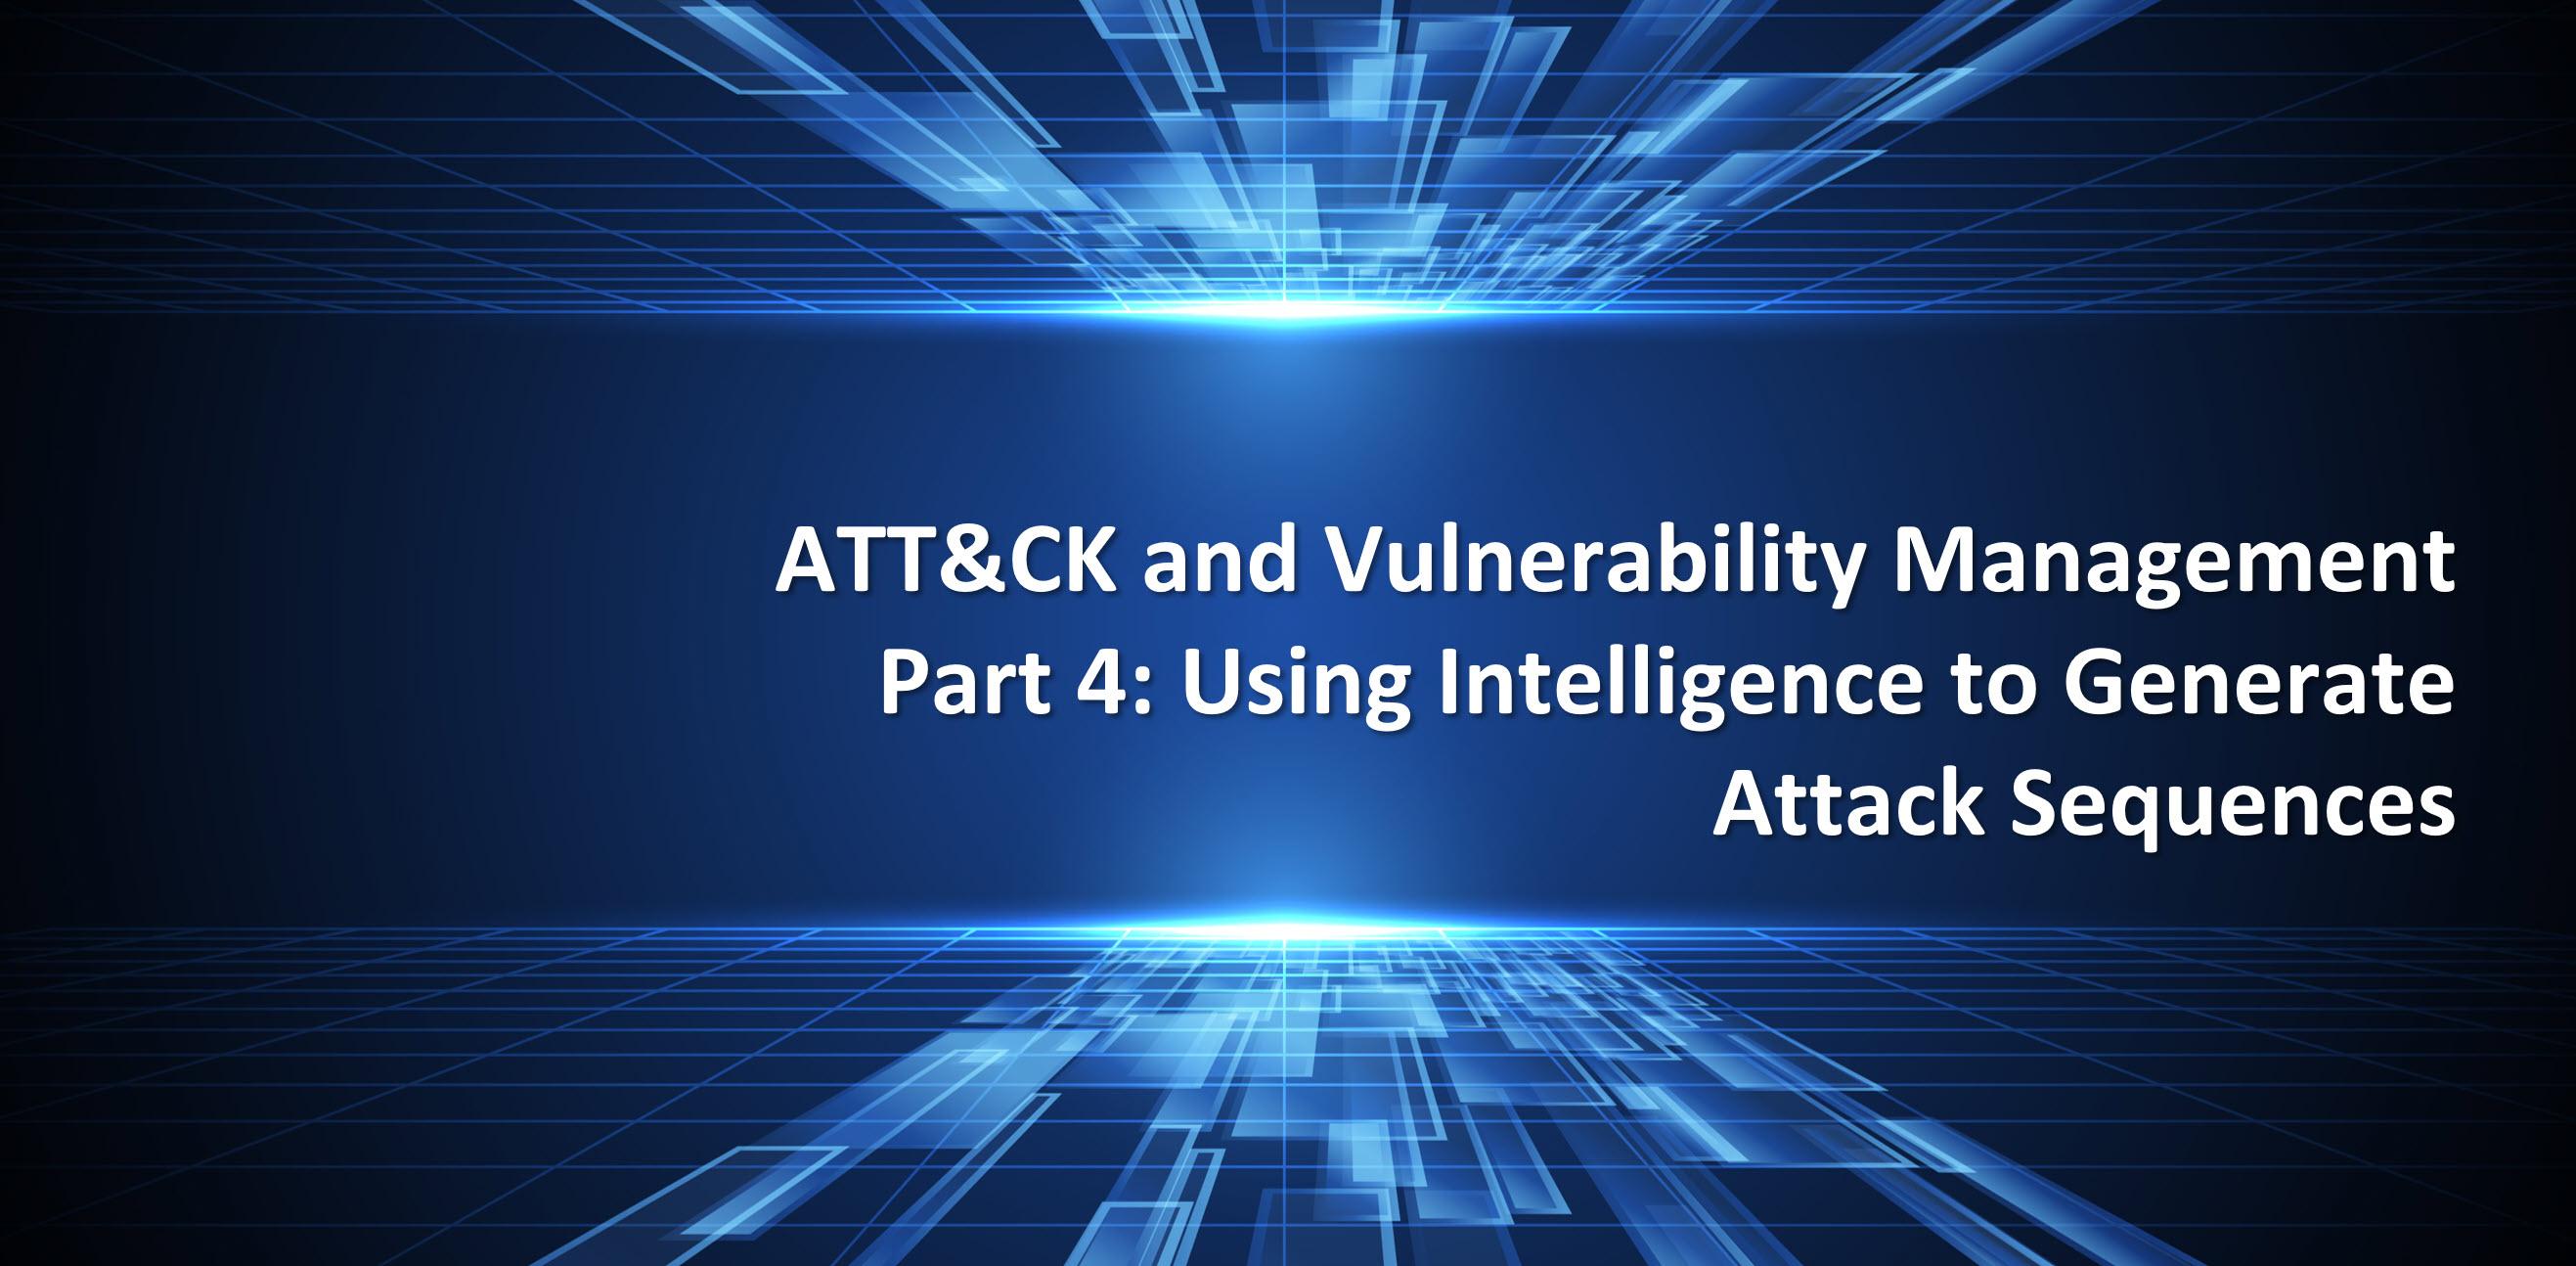 ATT&CK and Vulnerability Management Part 4Using Intelligence to Gene